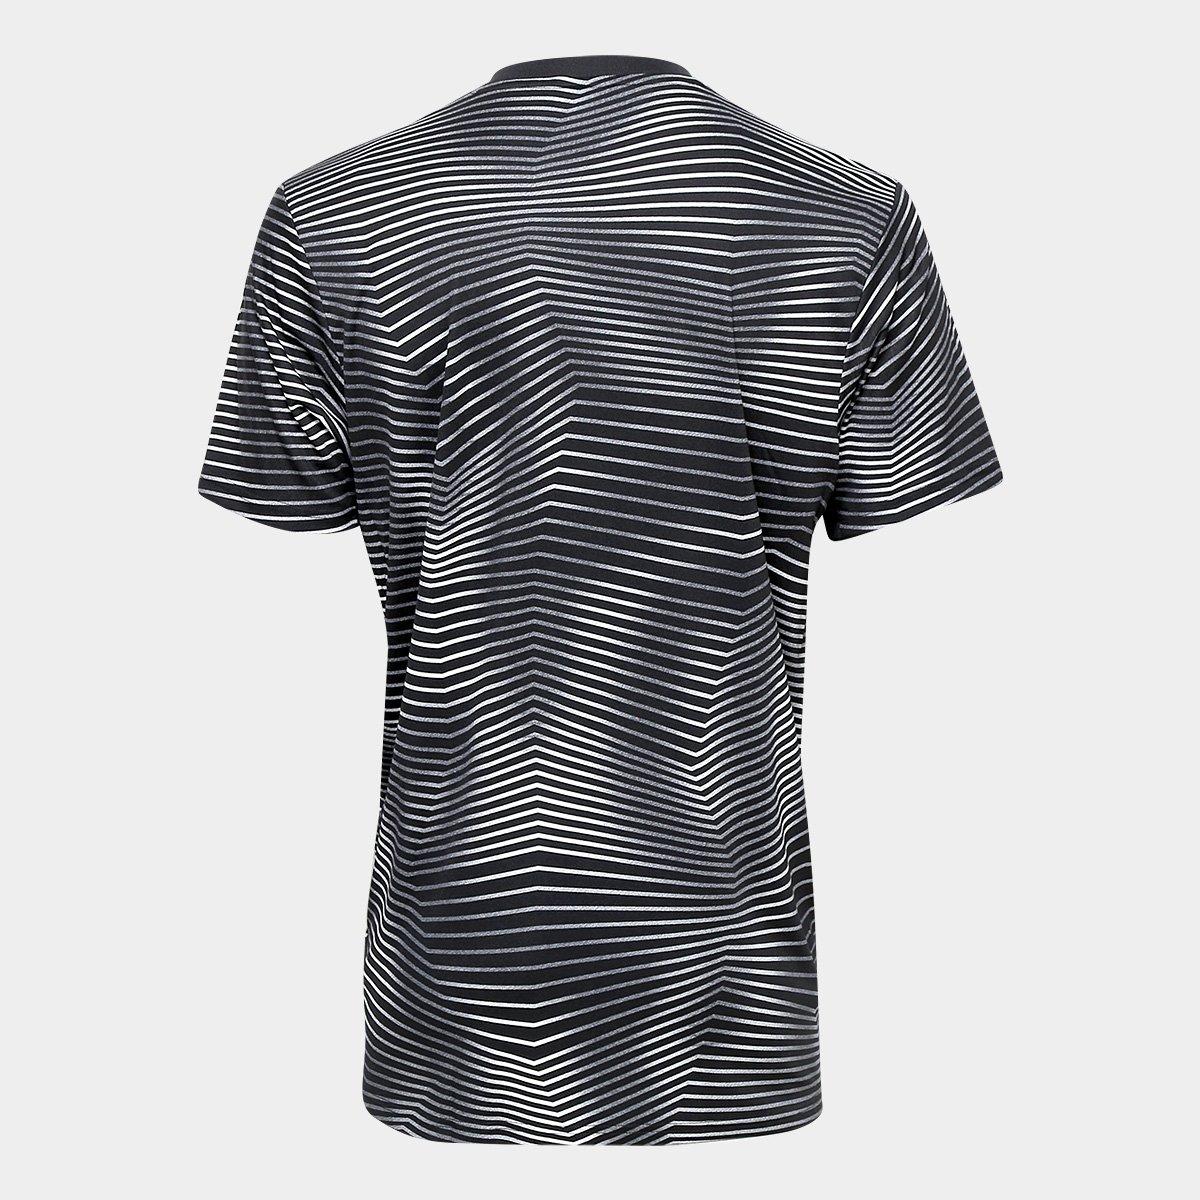 74982e71bde23 Camisa Juventus Pré-Jogo 19/20 Adidas Masculina - Tam: GG - Shopping ...